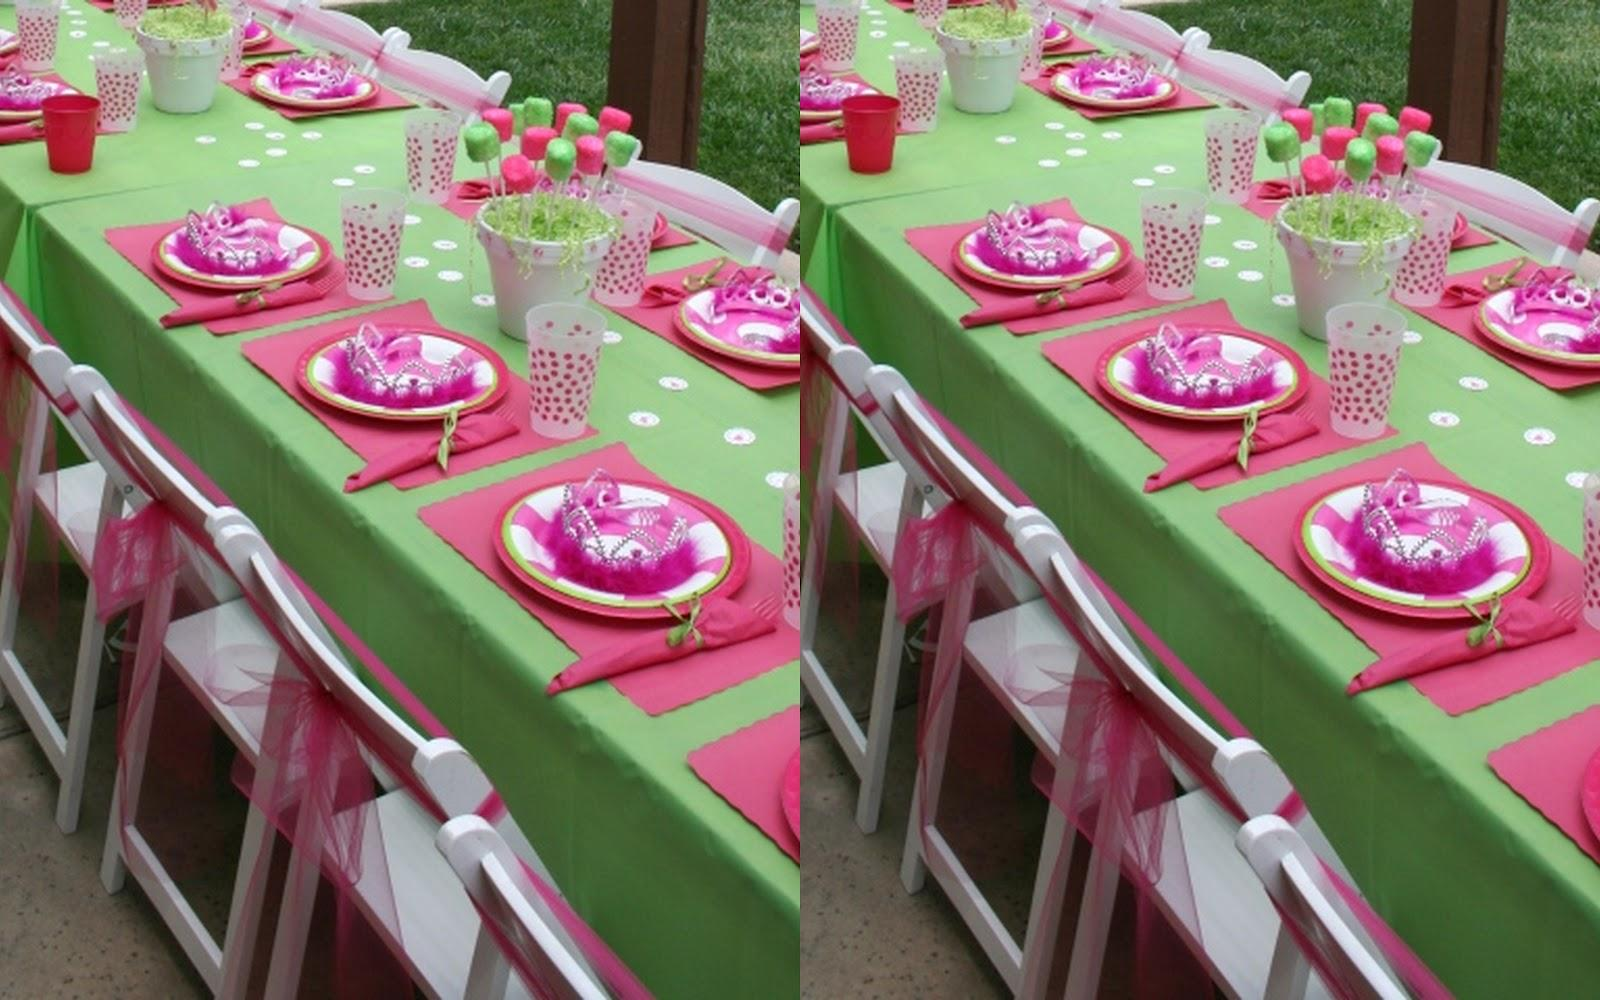 301 moved permanently - Decoracion de mesa de cumpleanos infantil ...